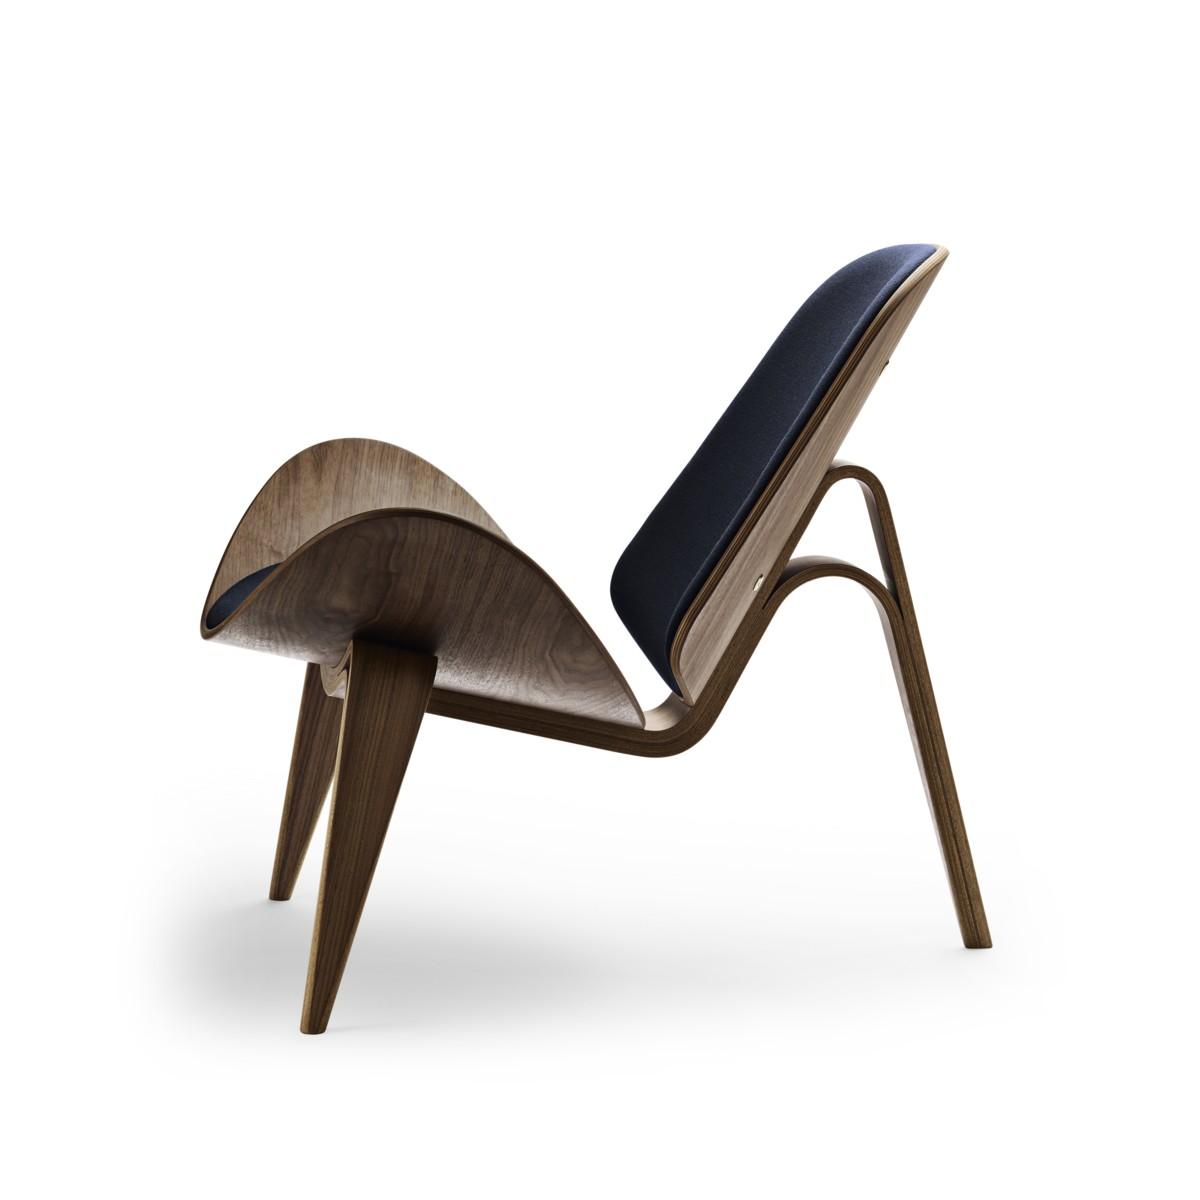 Side view of a Carl Hansen CH07 shell chair